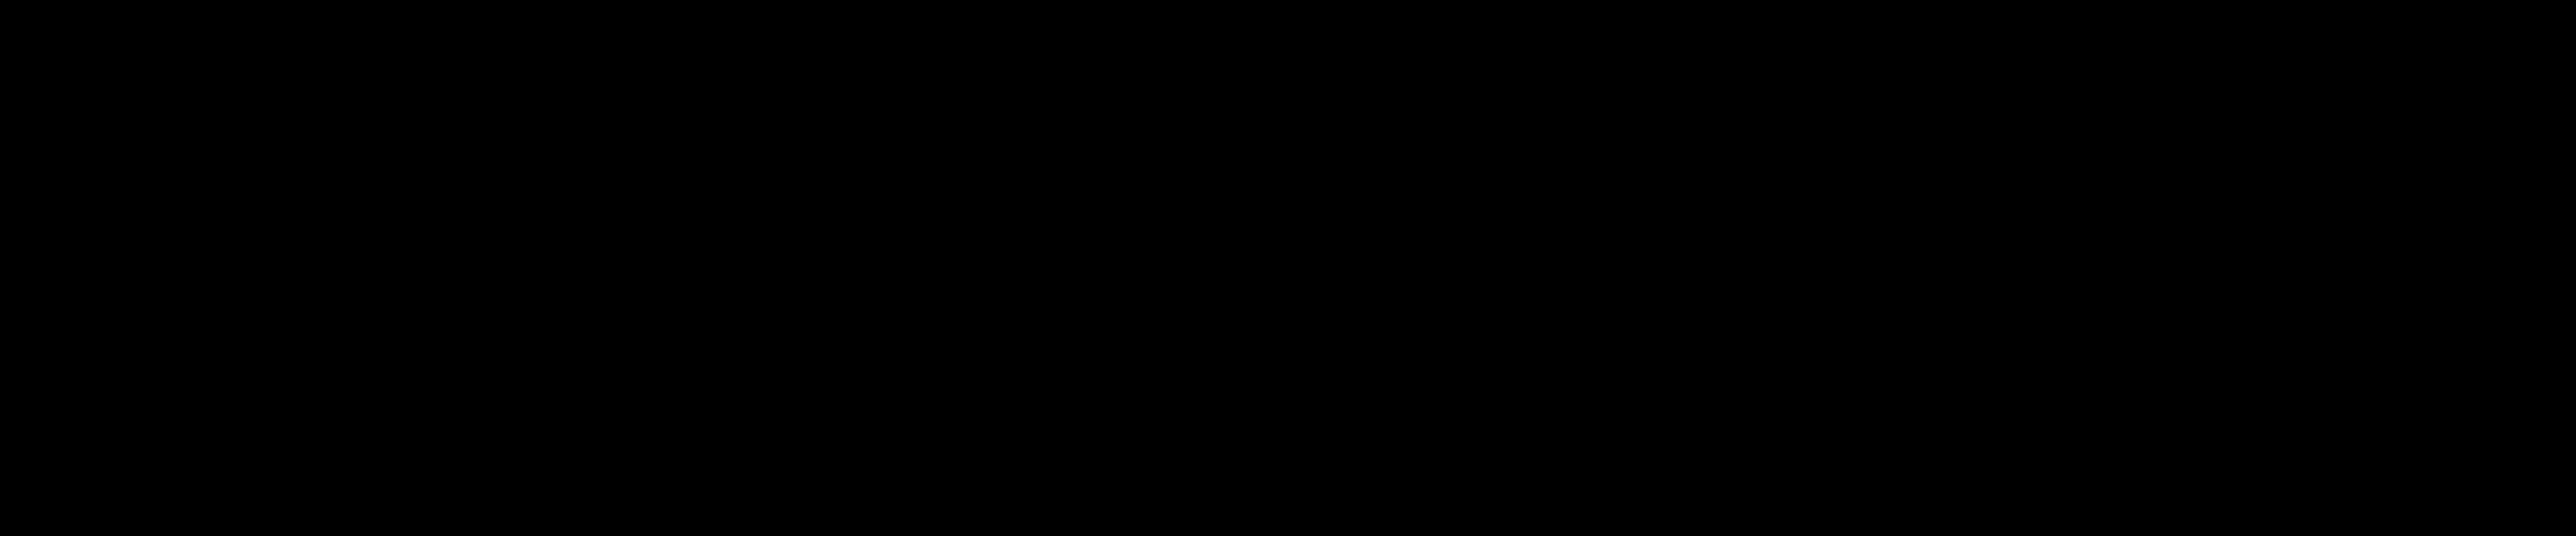 40934-68-7